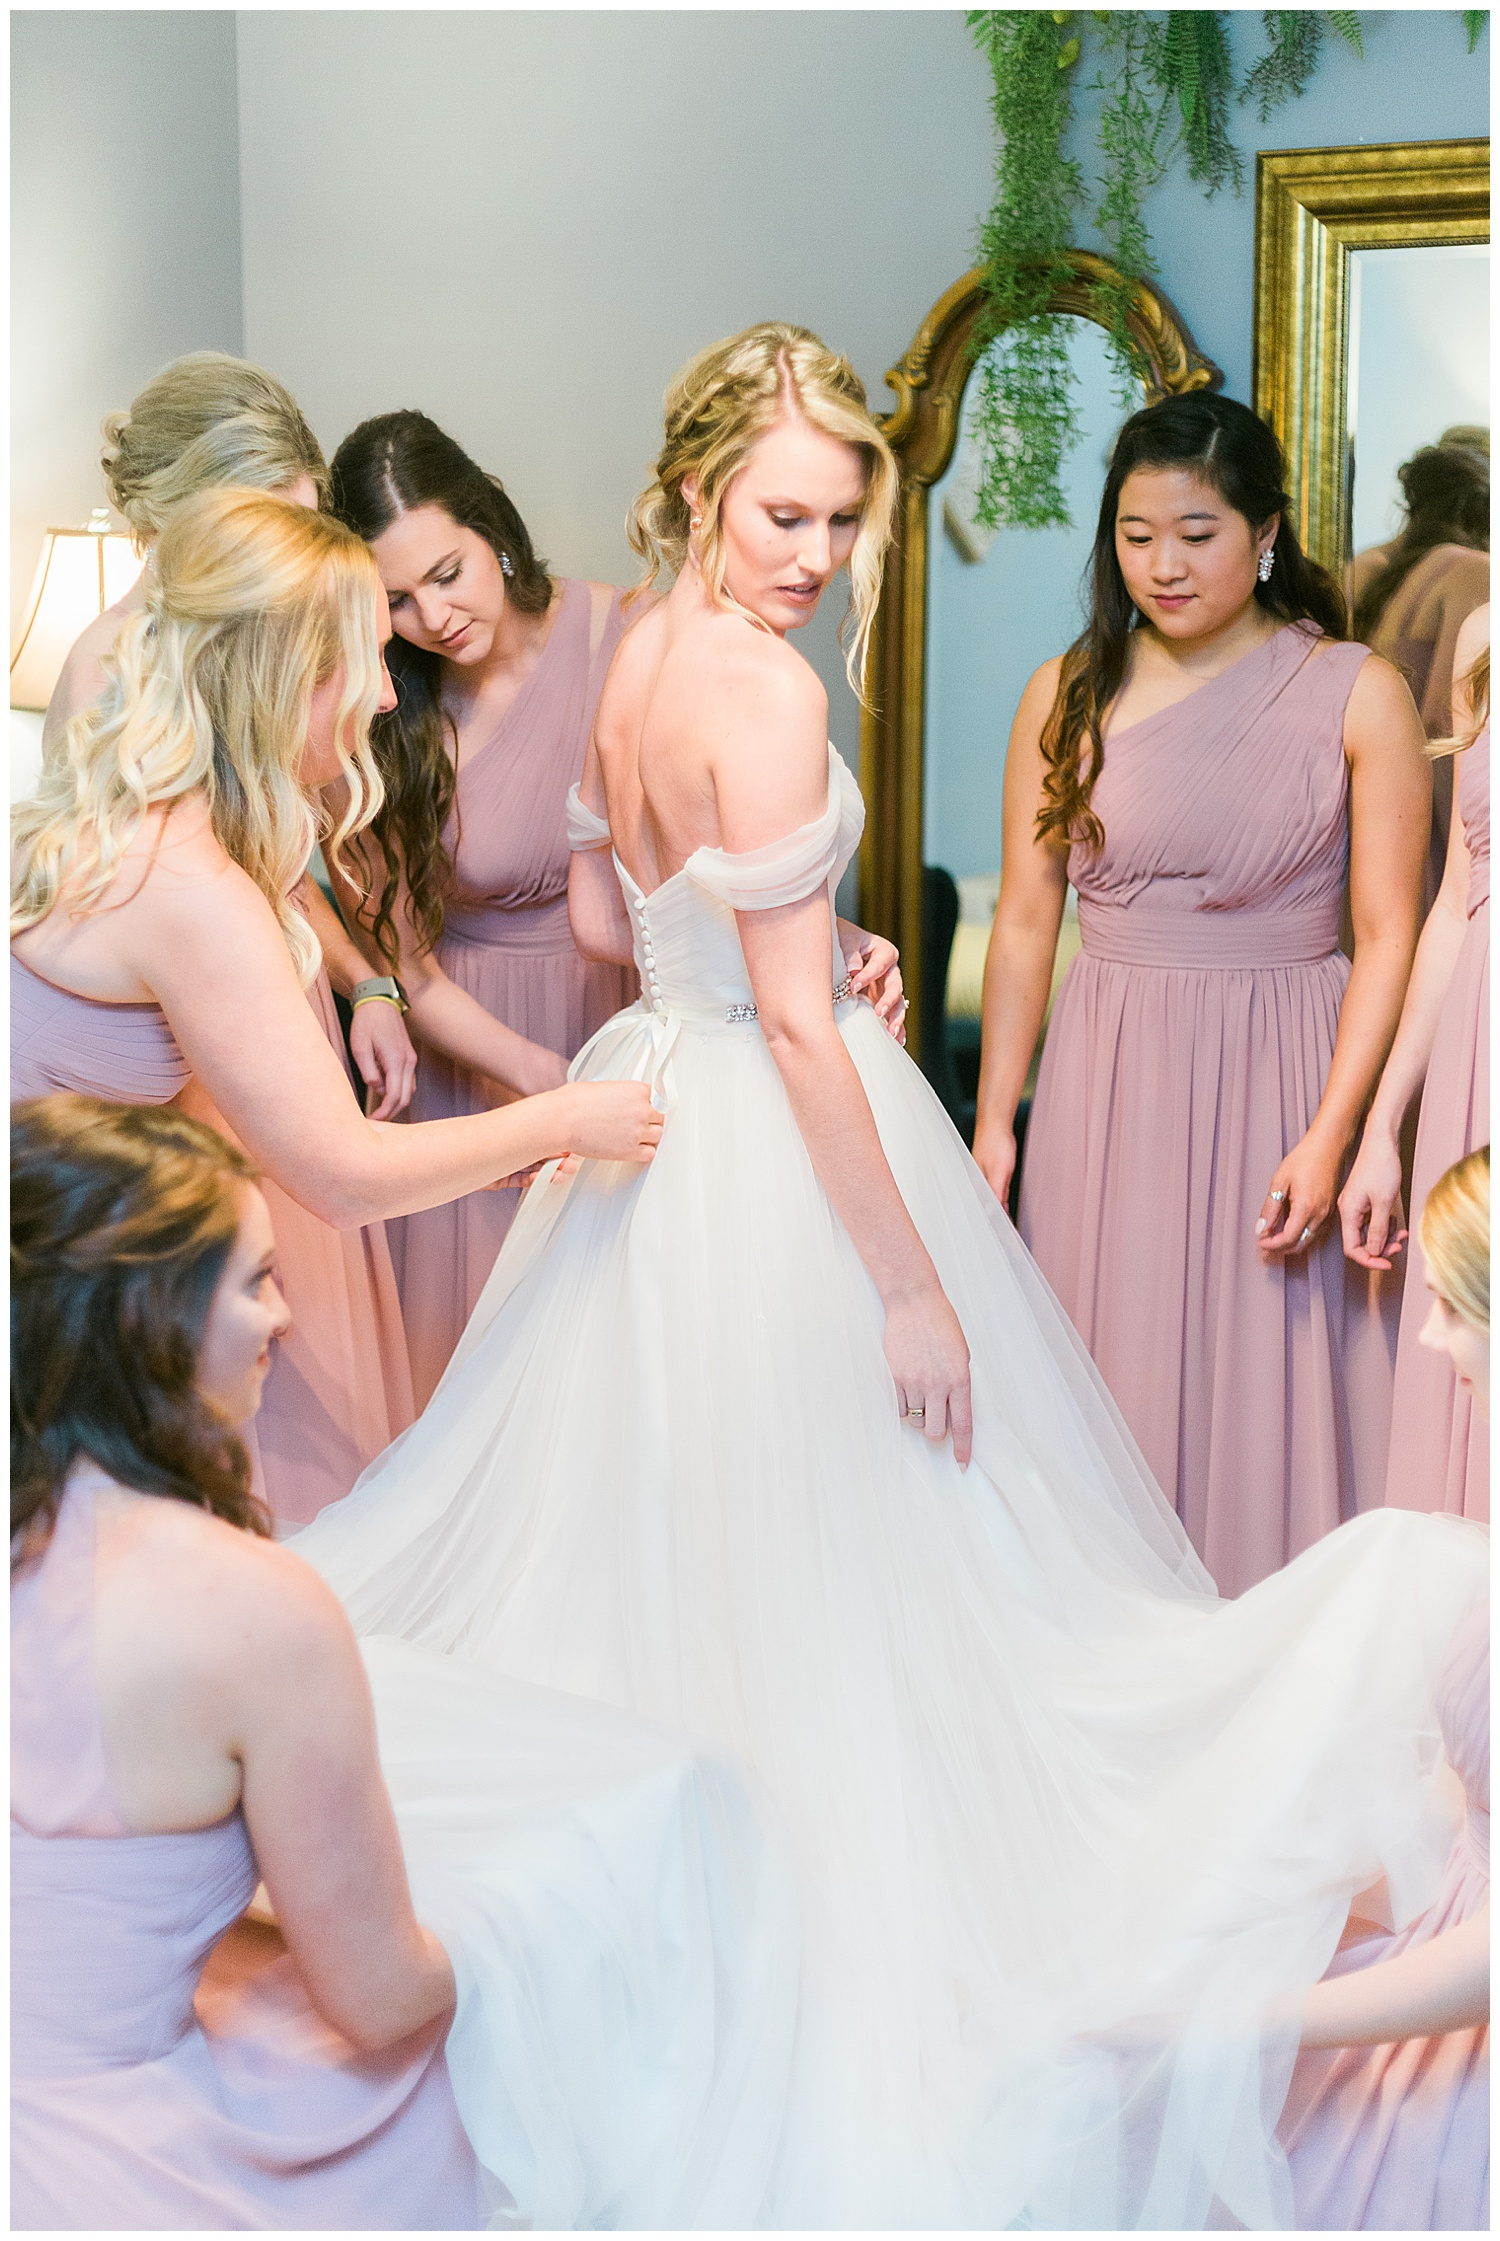 Ashton Creek Vineyard | Bride and Bridesmaids getting ready (Justin Alexander ball gown wedding dress in blush pink.)